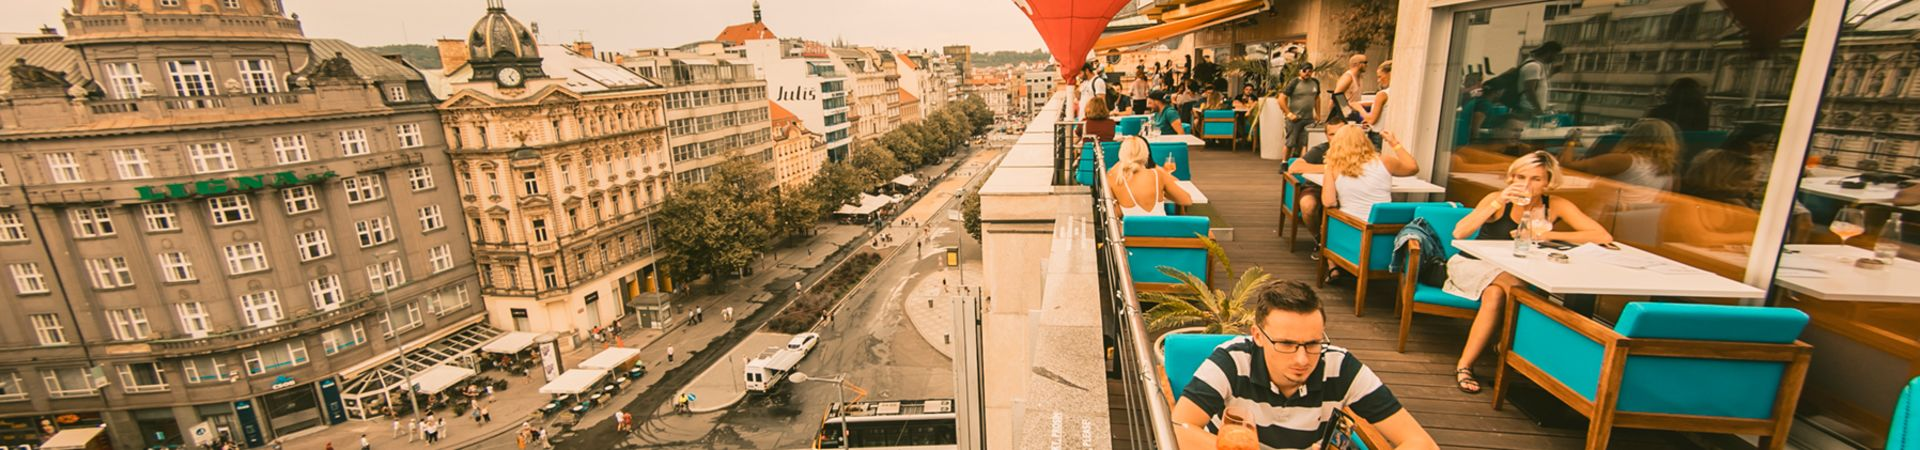 DupleX, The Rooftop Venue